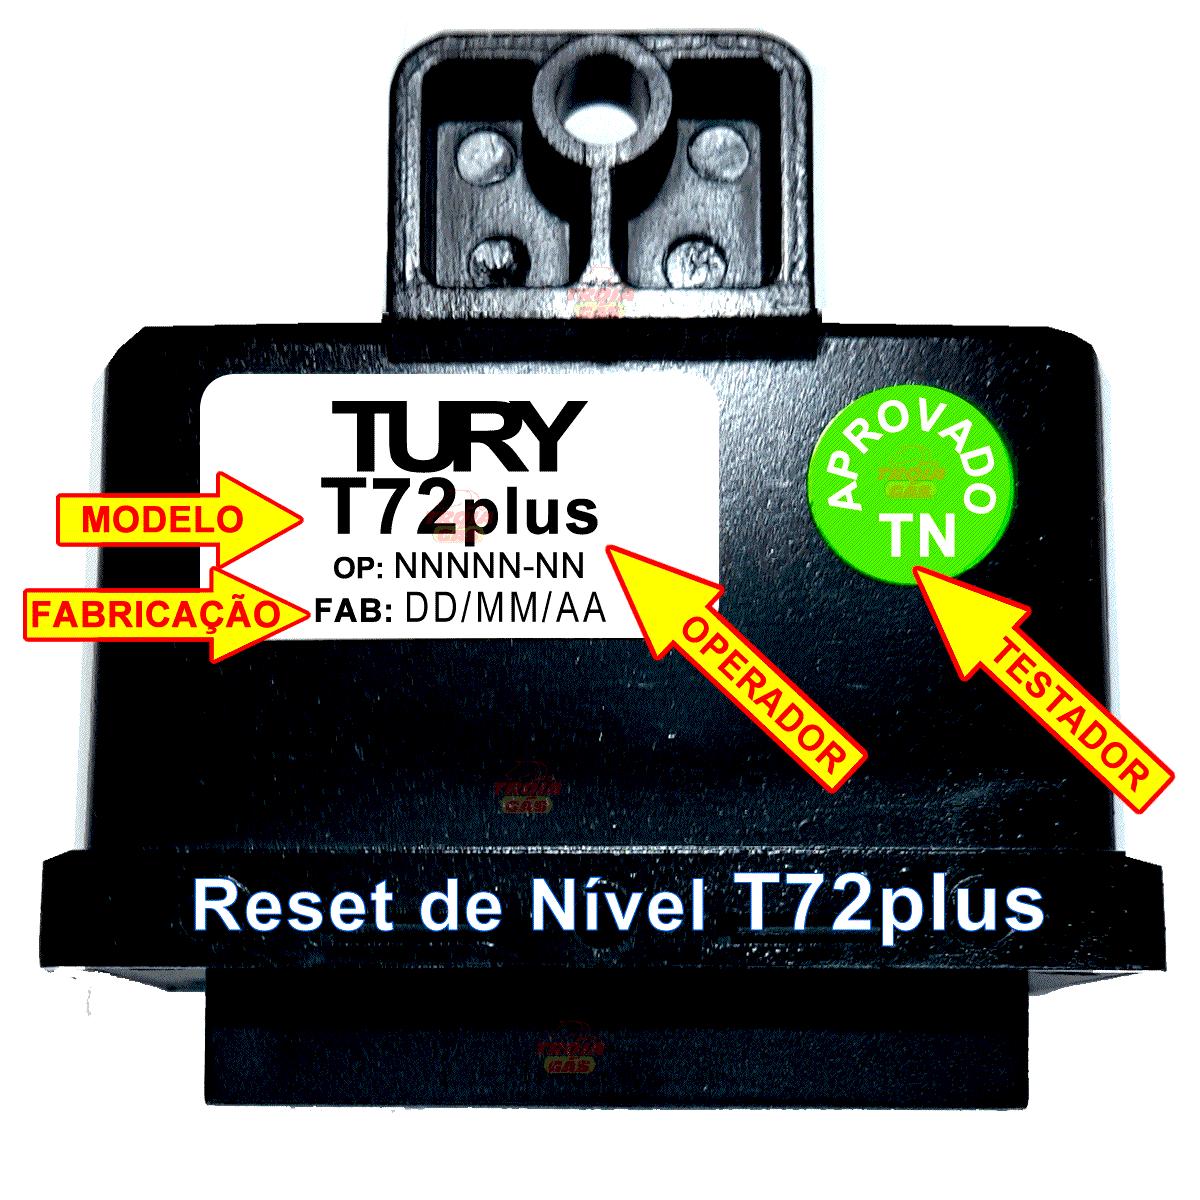 Reset de Nível Combustível T72 PLUS TURY GAS